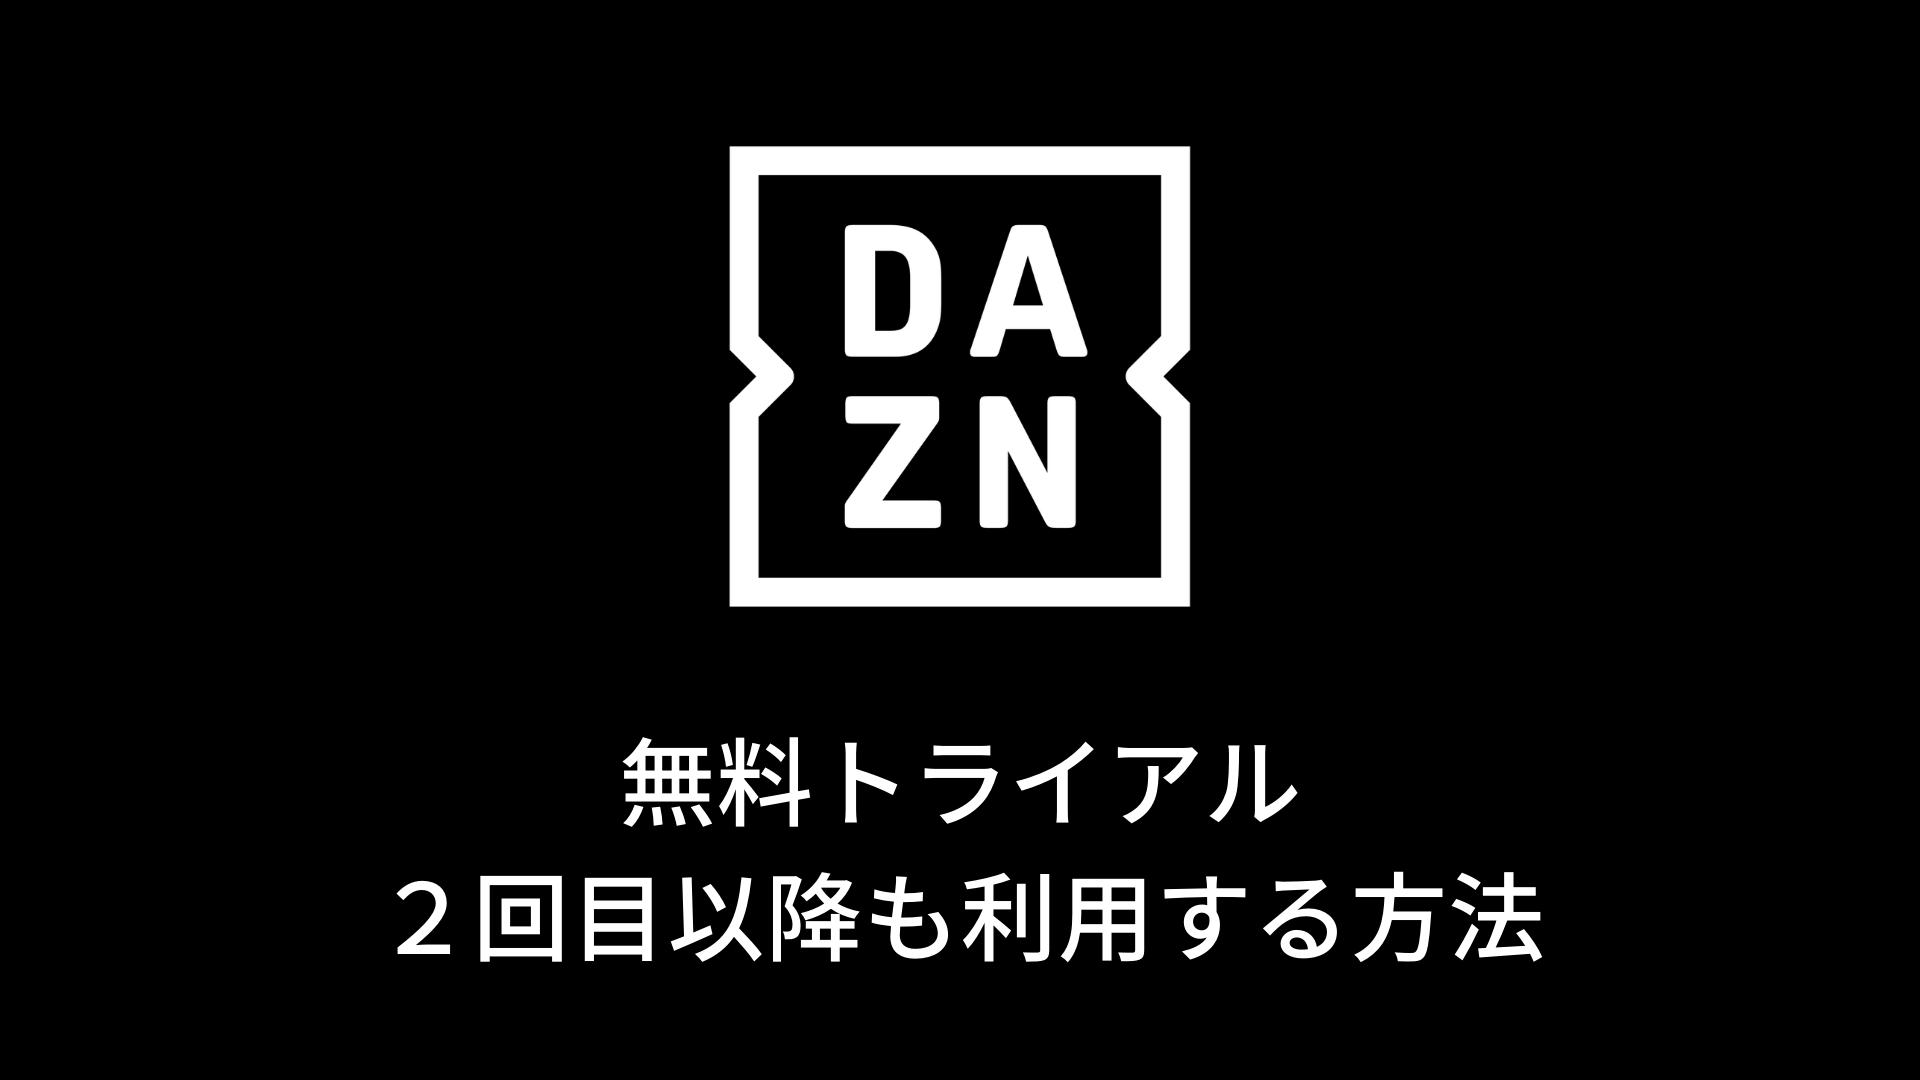 DAZNの無料期間は2回目でも利用できる?再加入方法を解説!